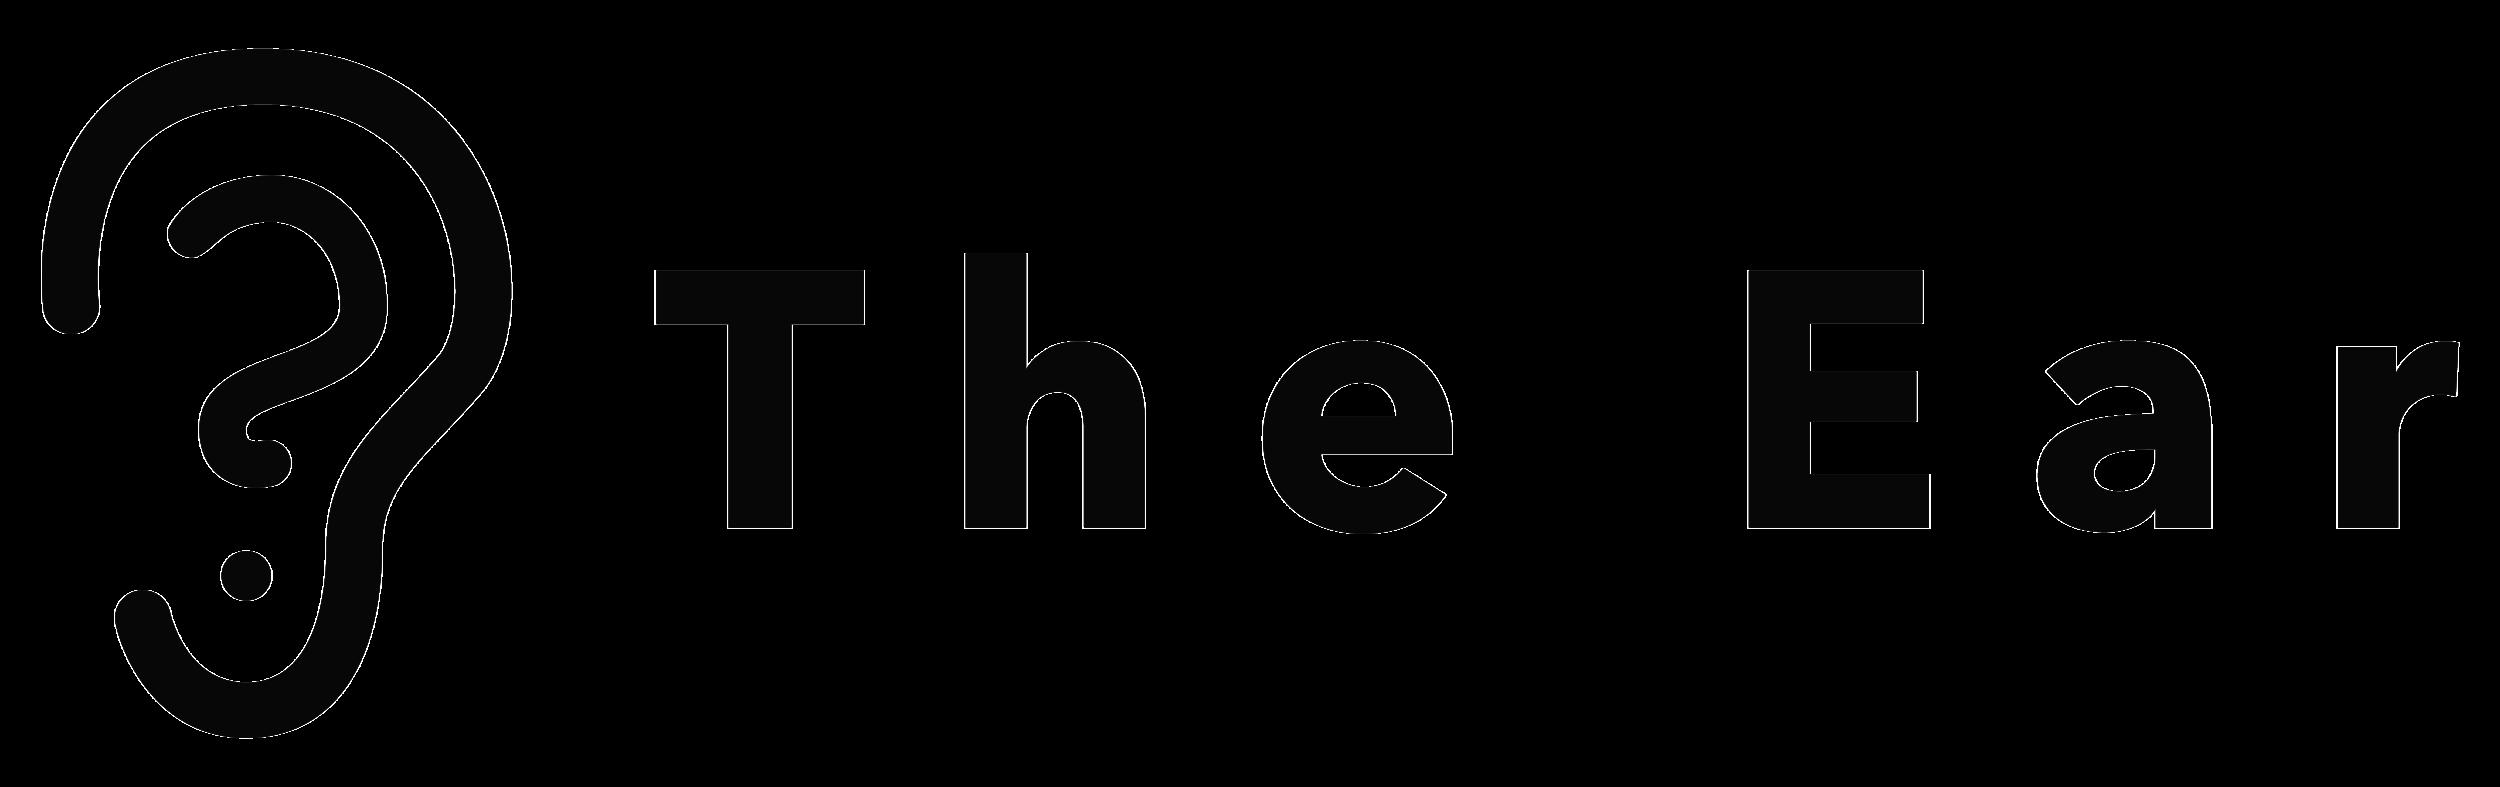 the ear podcast identity system horizontal black logo